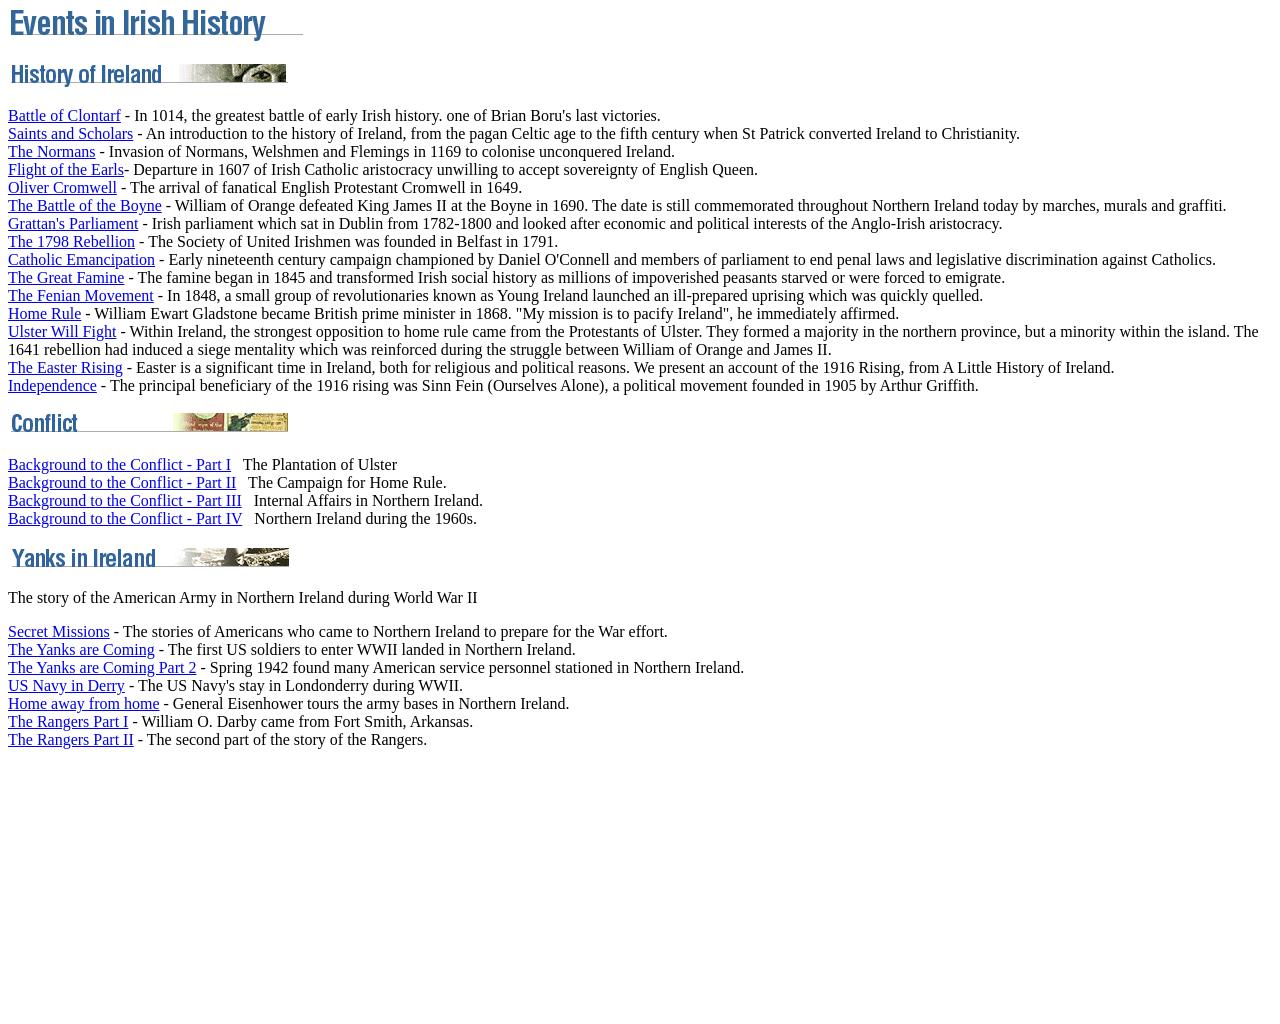 A History of Ireland (irelandseye.com)